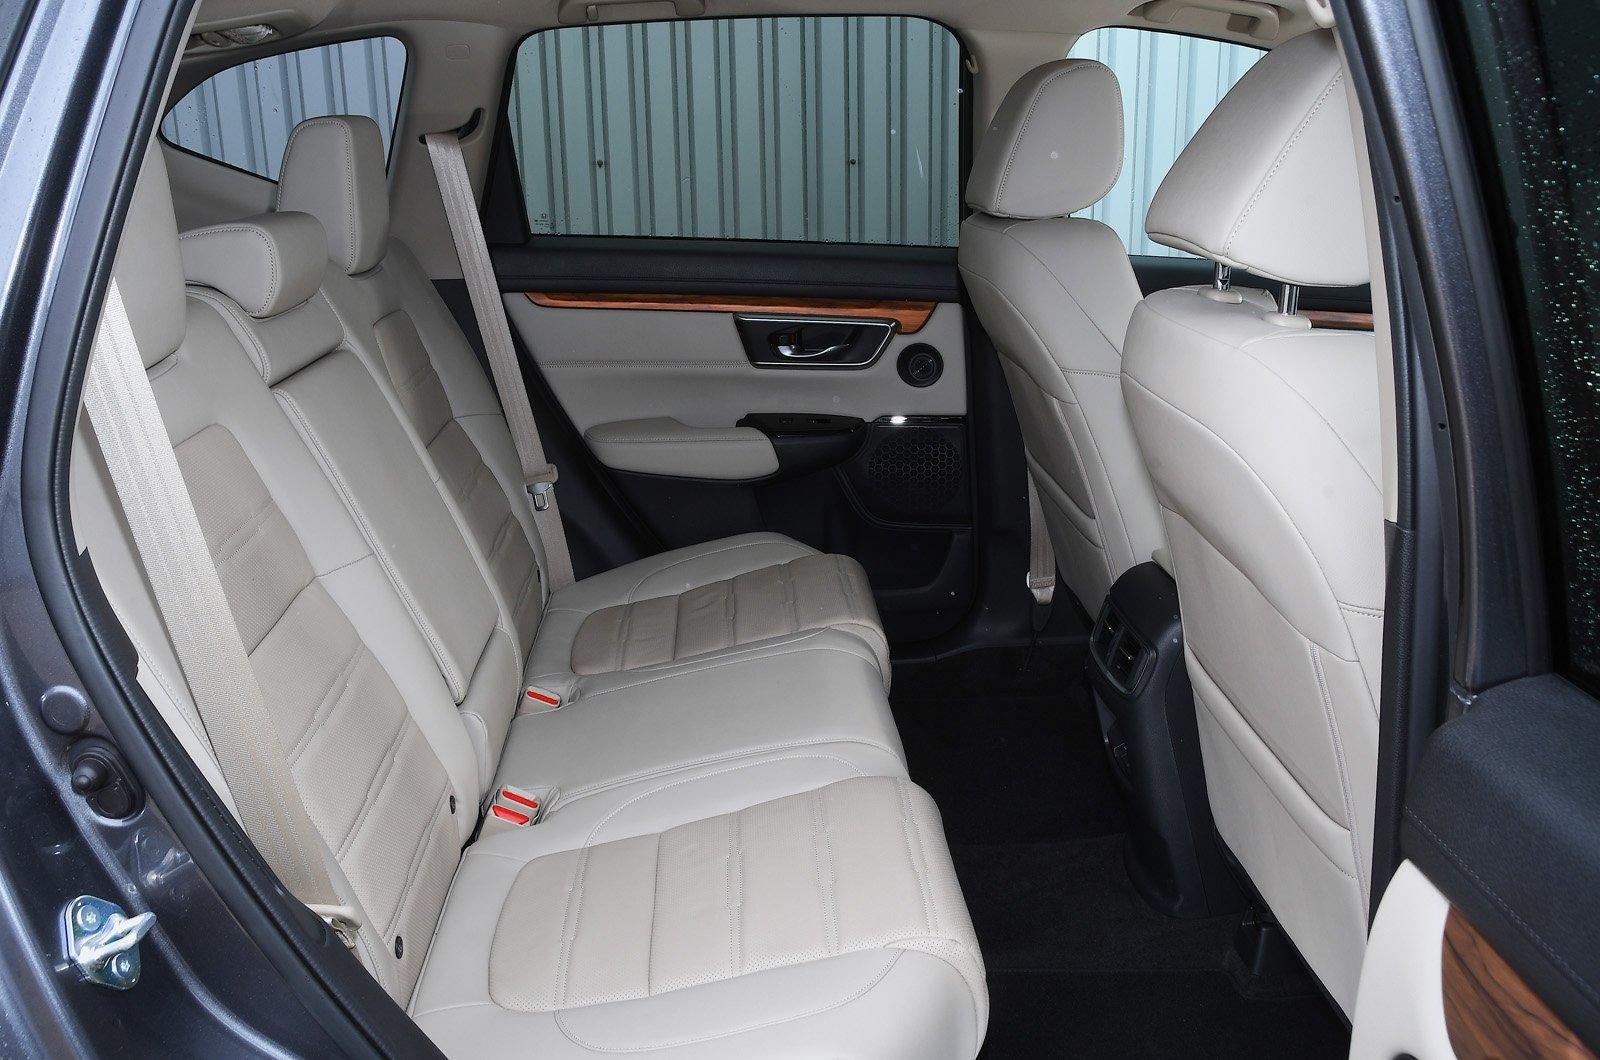 Honda CR-V 2021 rear seats